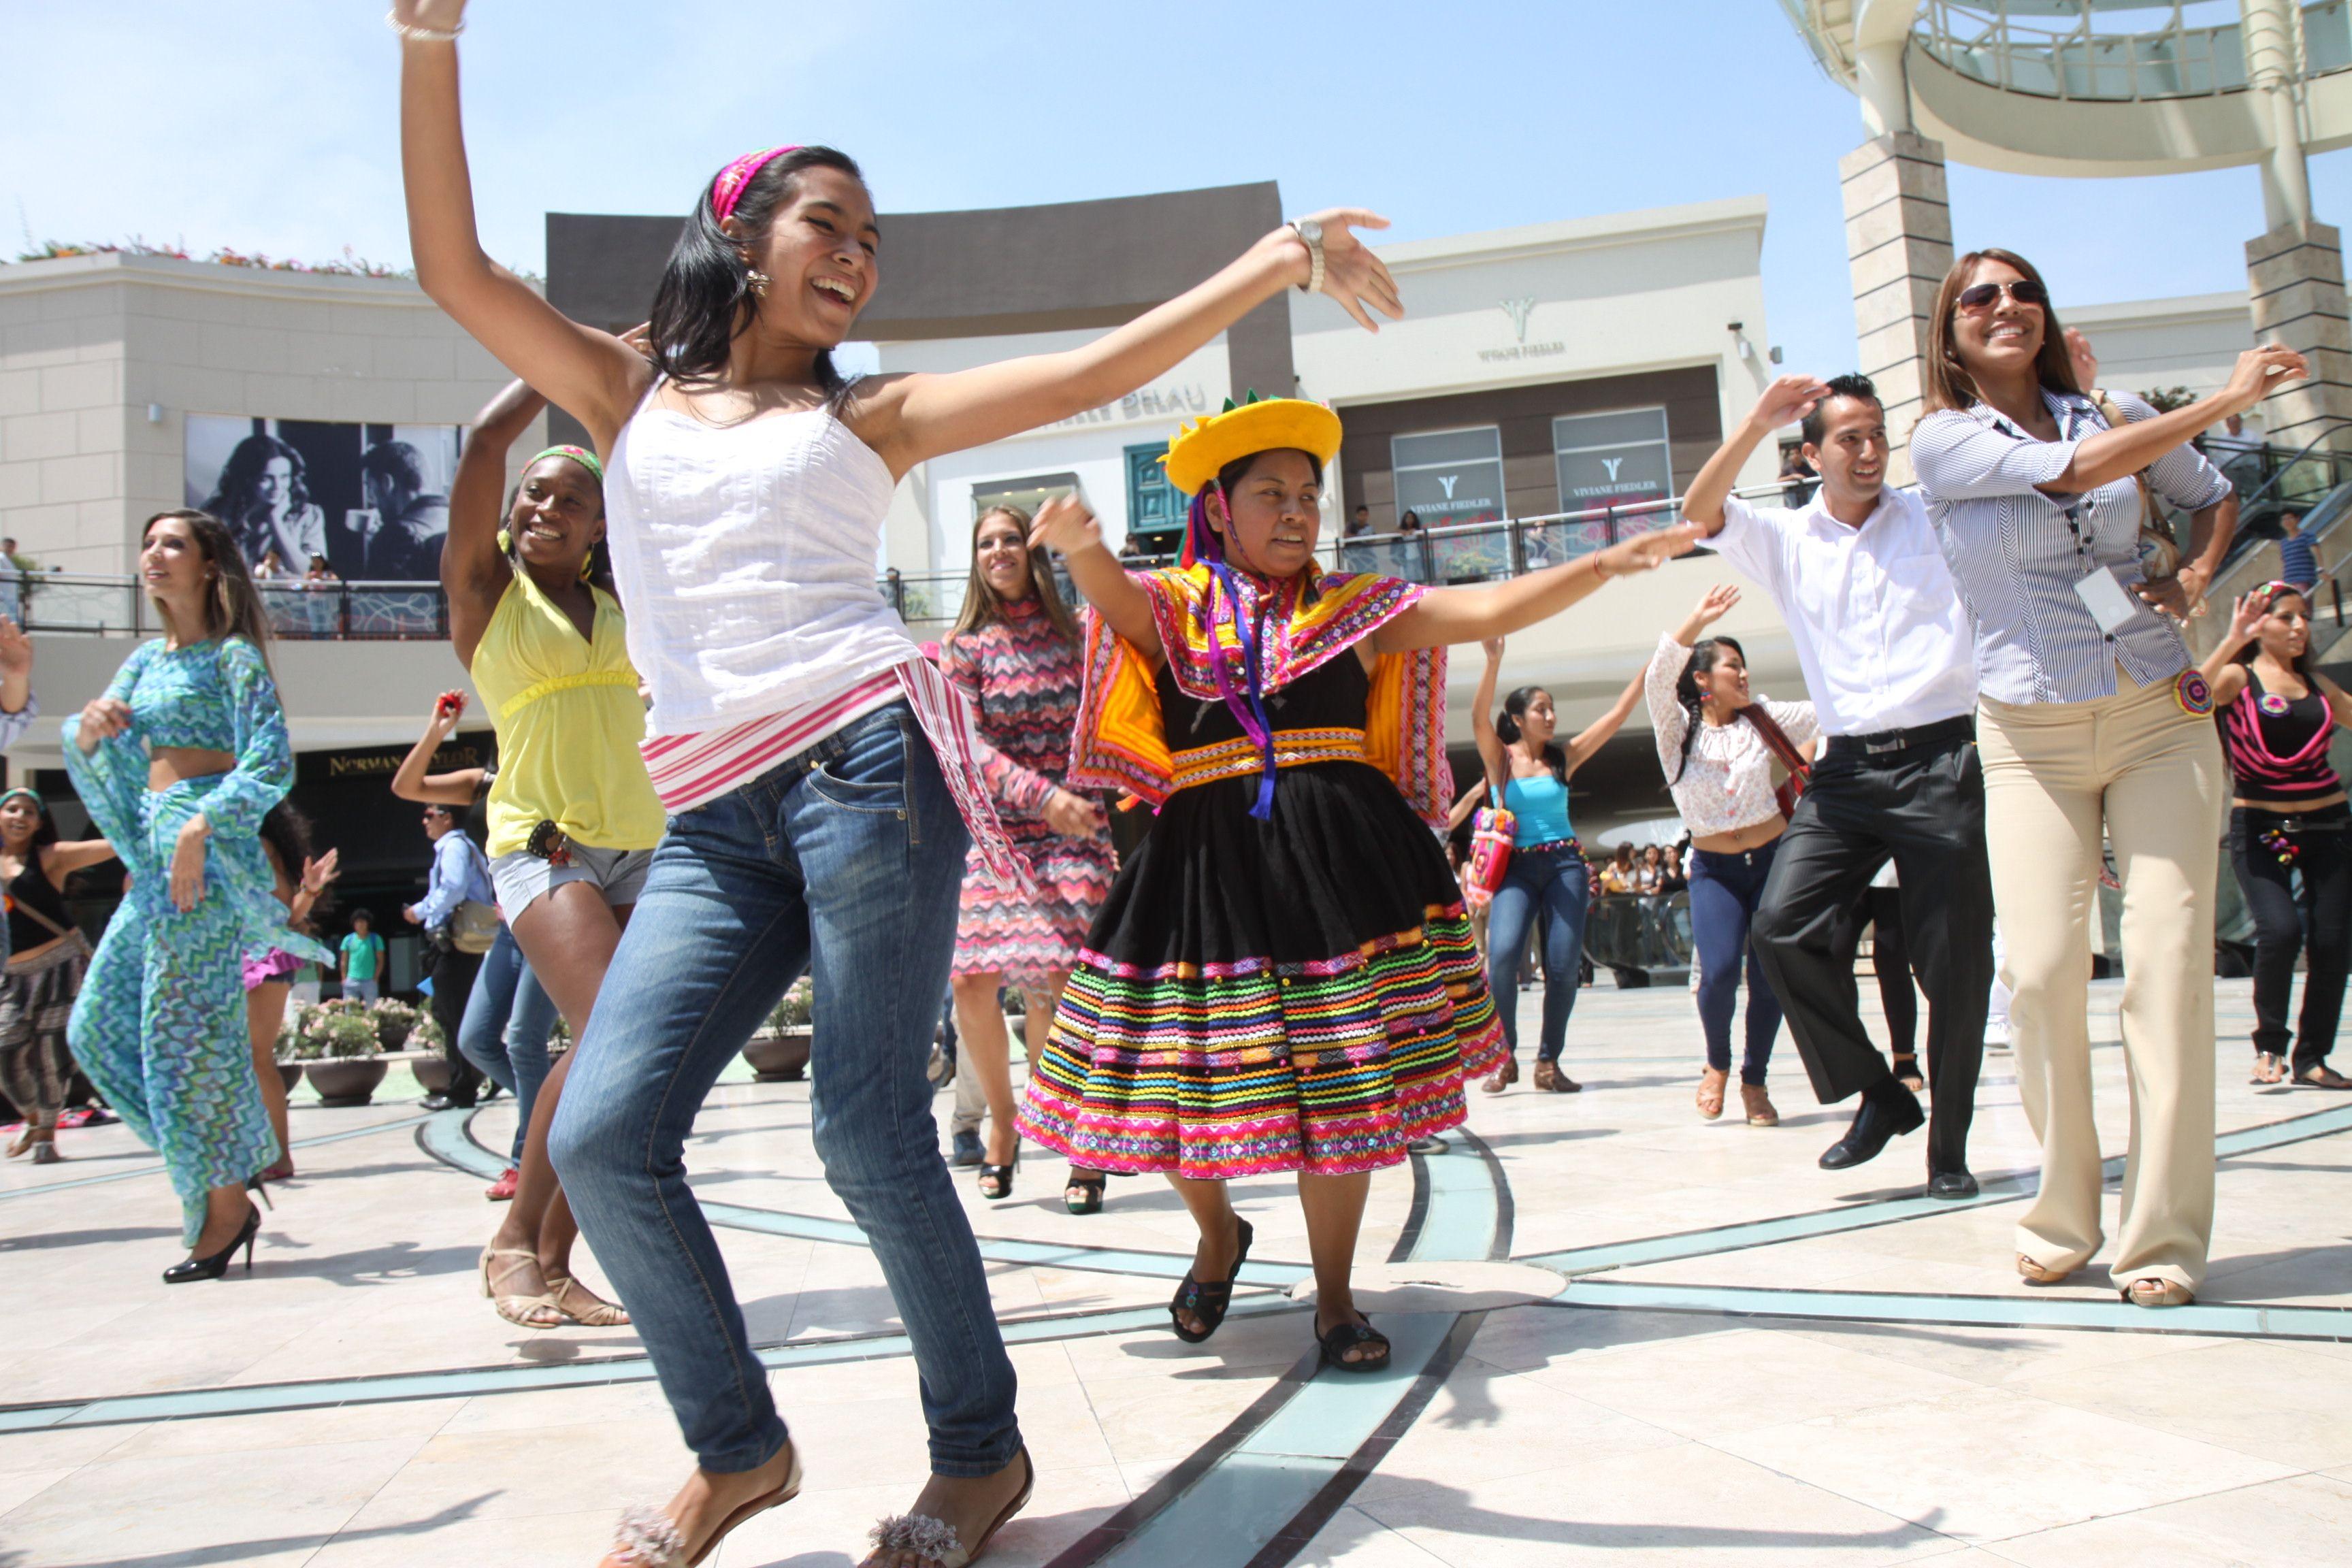 Nuevo Post sobre el inicio del Perú Moda 2013 http://www.misshunter-blog.com/2013/04/peru-moda-2013-inicio-con-un-flashmob.html